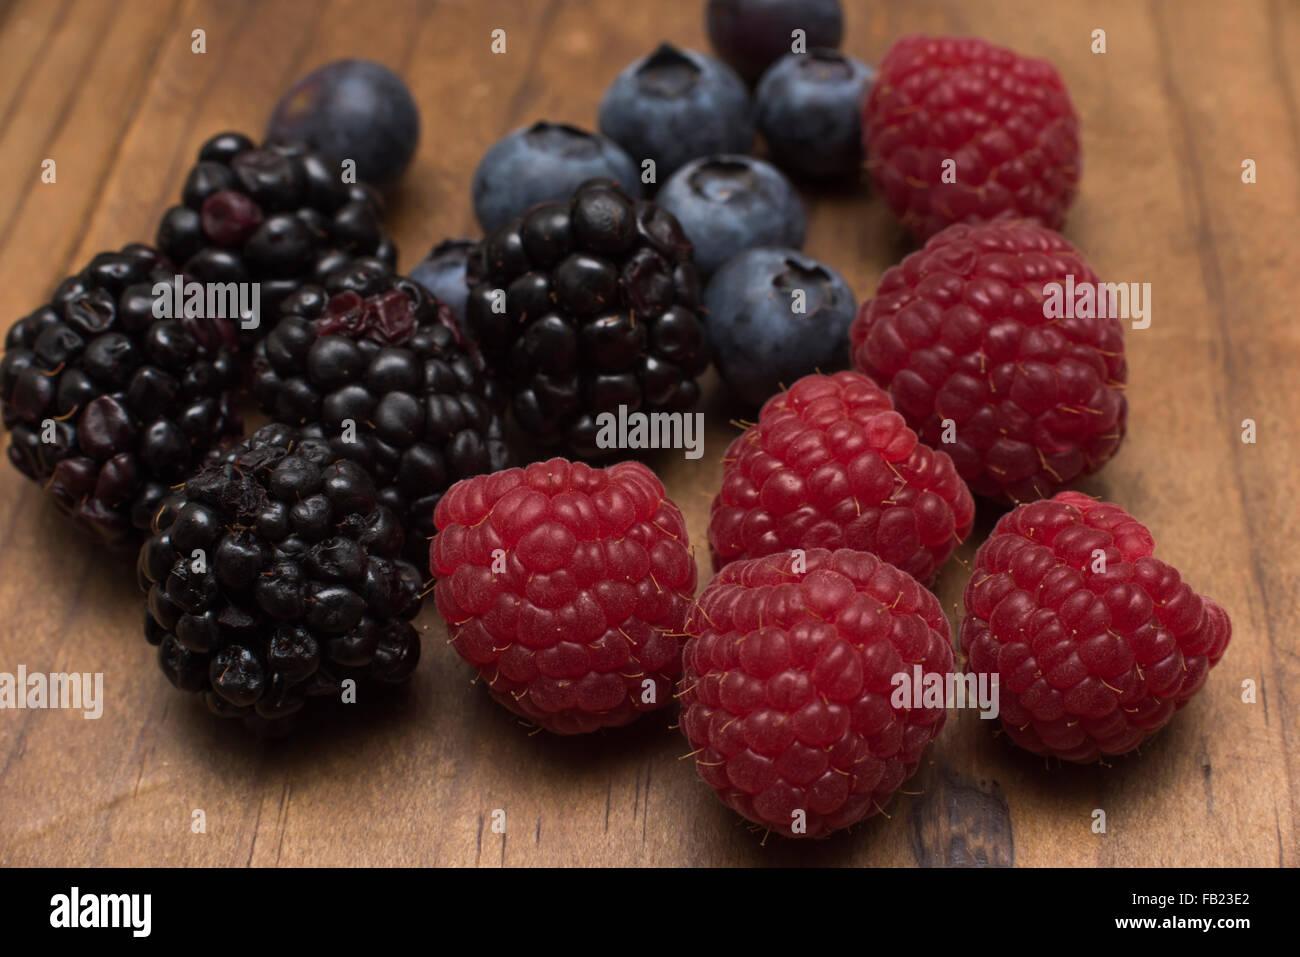 Fresh Mixed Berries (Blackberry, Raspberry, Blueberry) - Stock Image